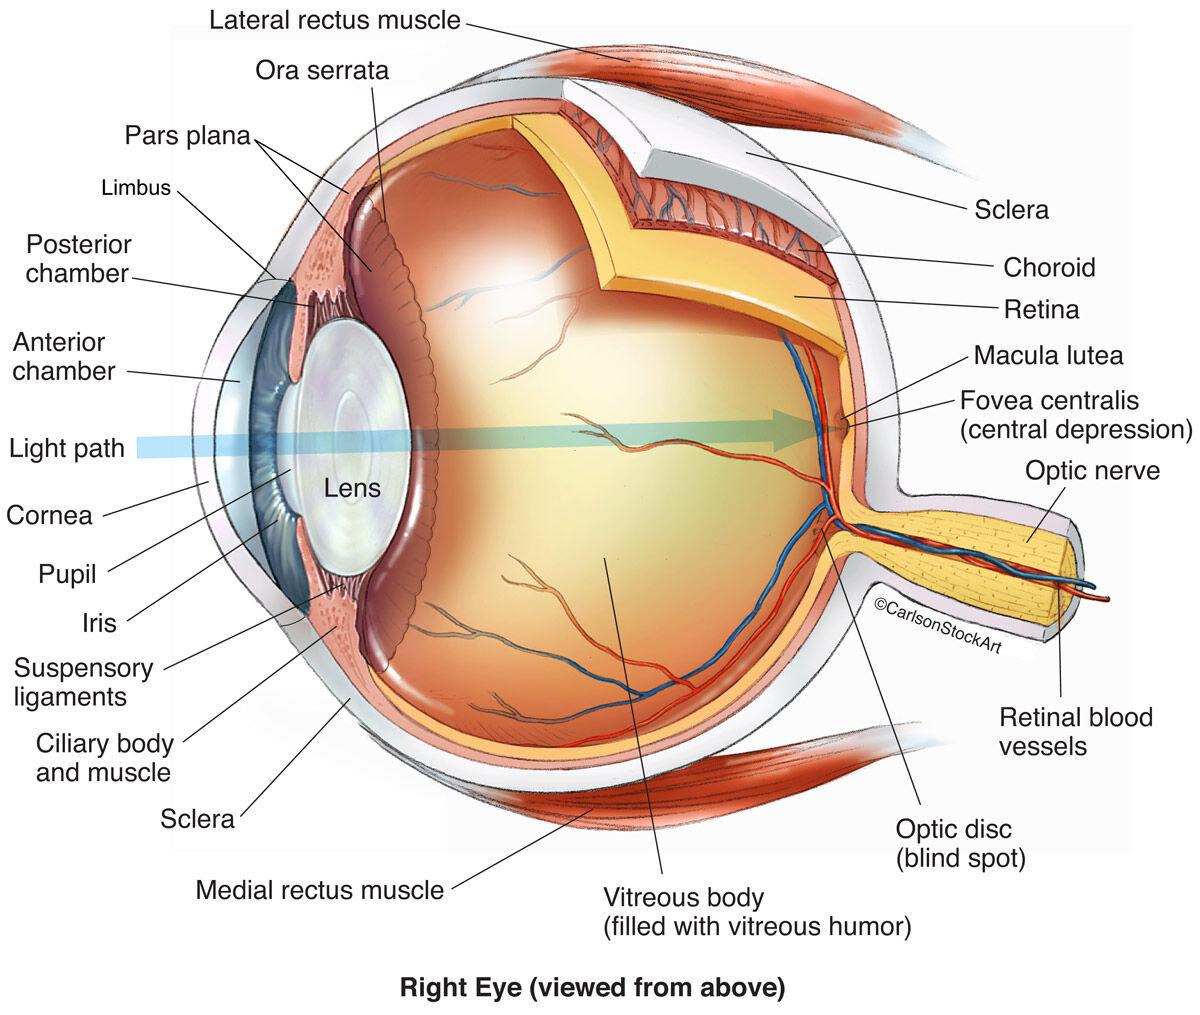 Cow Eye Fovea Centralis